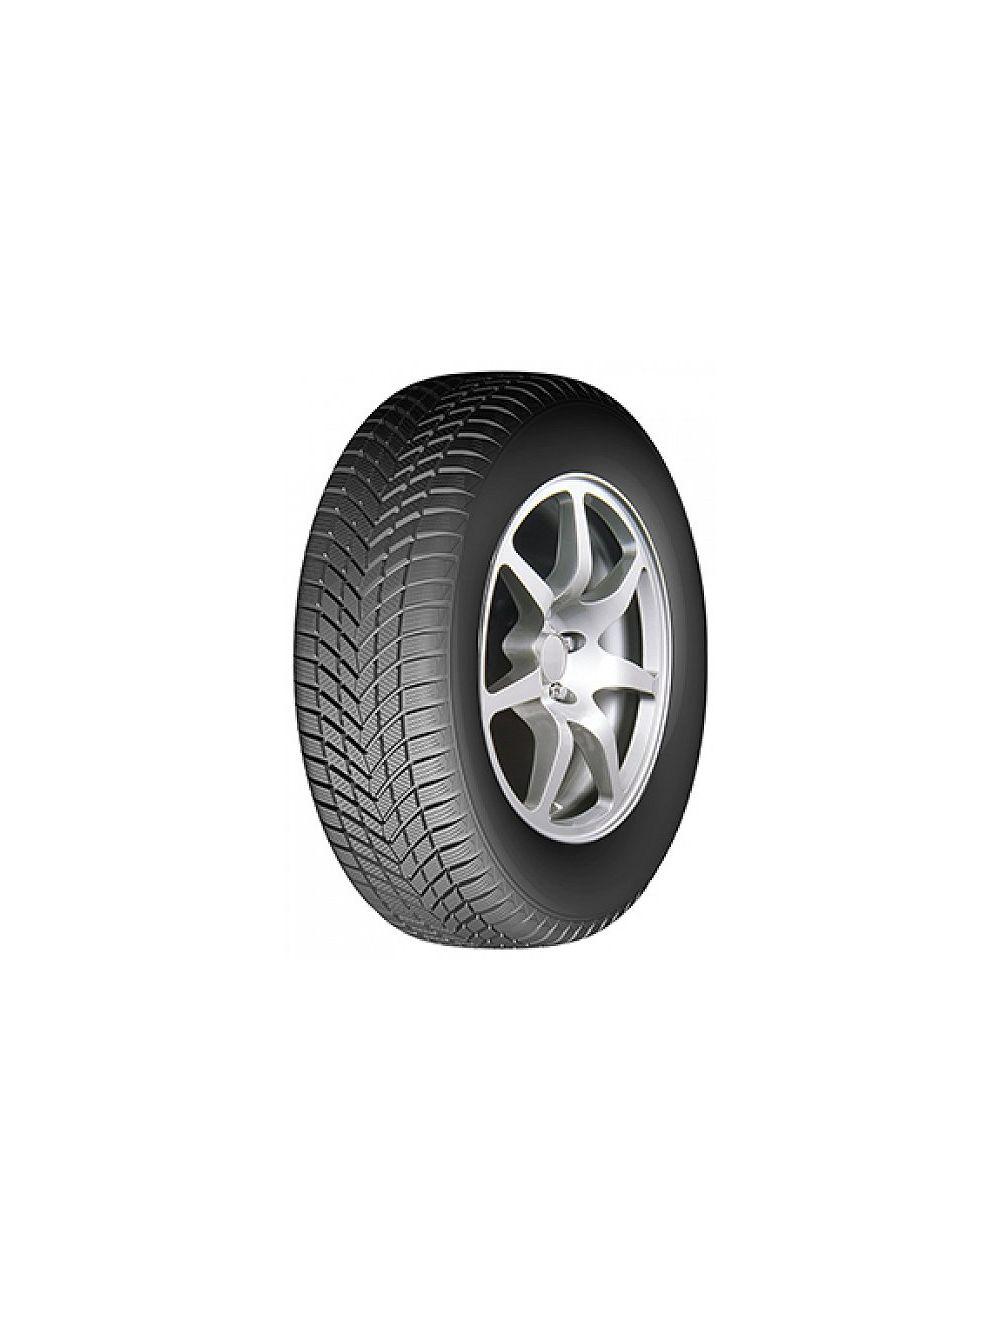 Infinity 175/65R15 T EcoZen Téli gumi